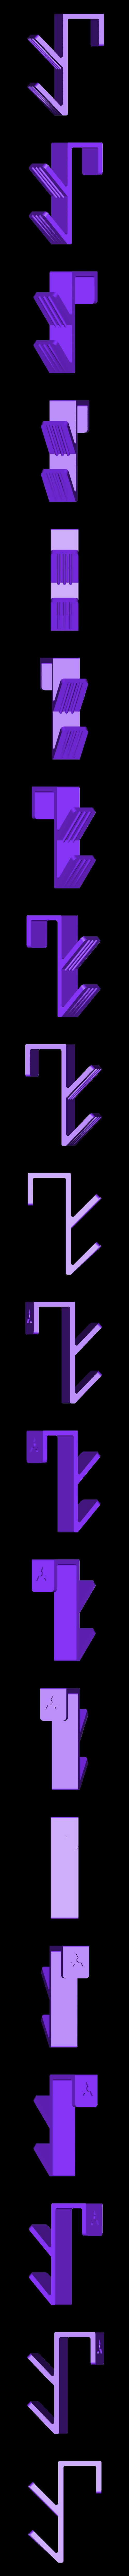 Cubical_Hook-_Beefy.stl Download free STL file Beefy Cubical Hook • 3D printing design, DraftingJake